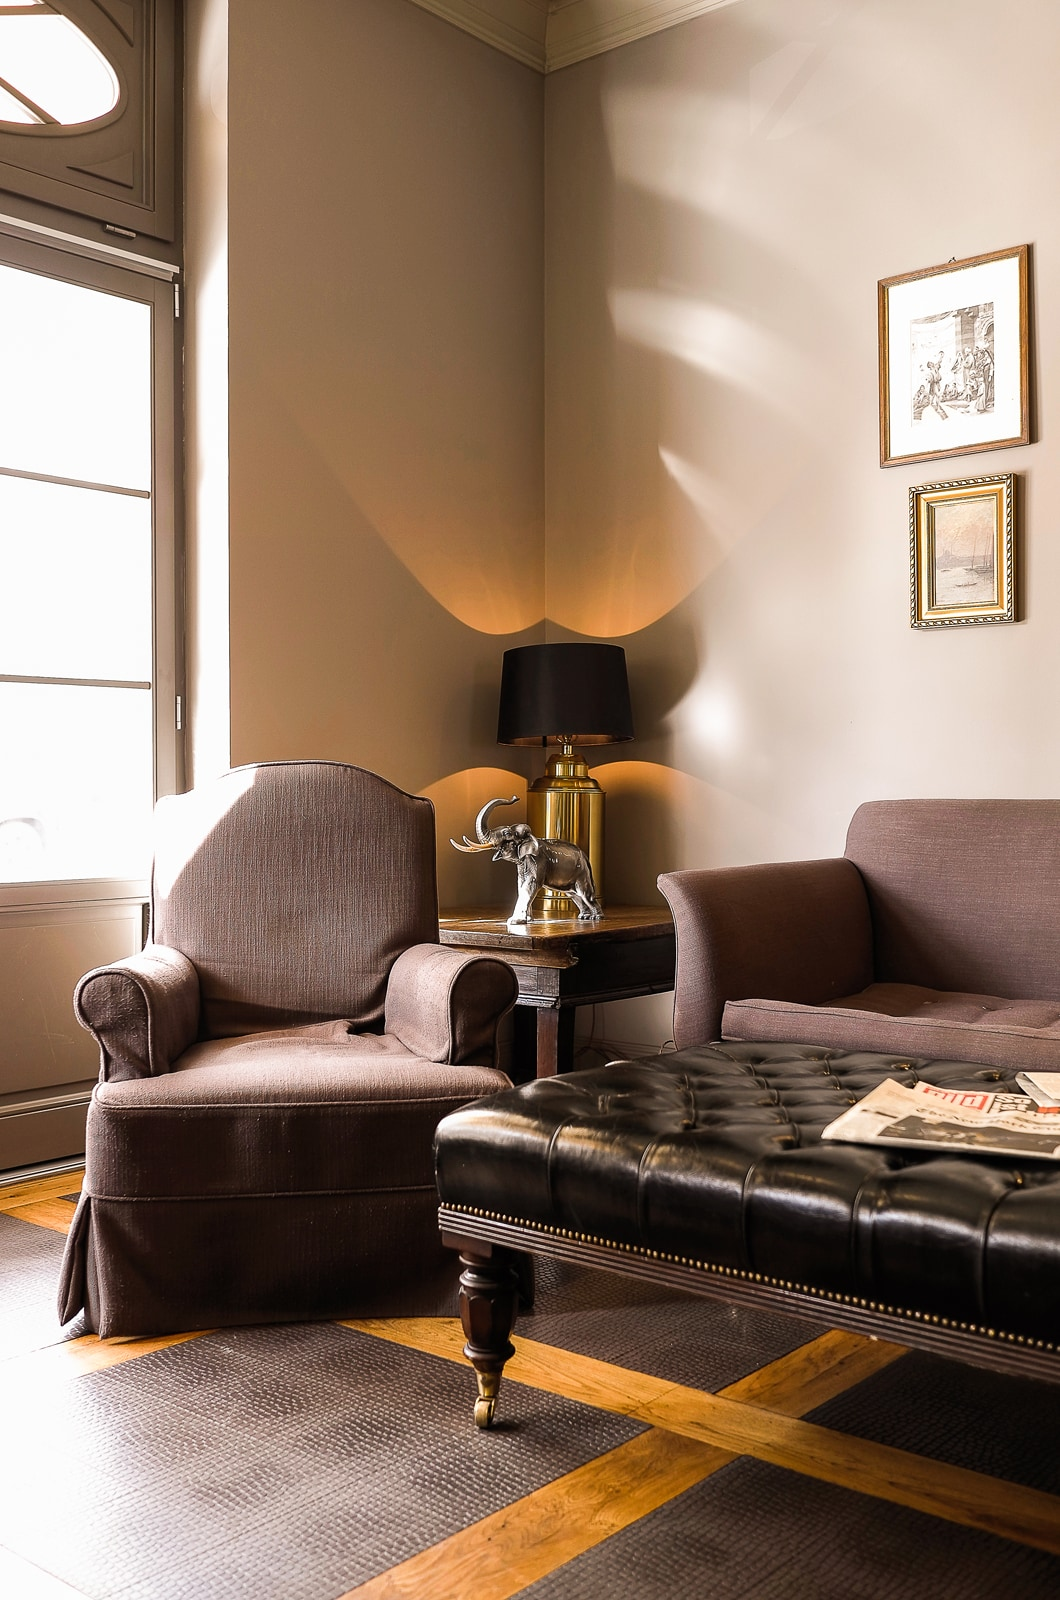 zementfliesen-VIA_zementmosaikplatten-nr.40760-hotel-monbijou-02-viaplatten   40760